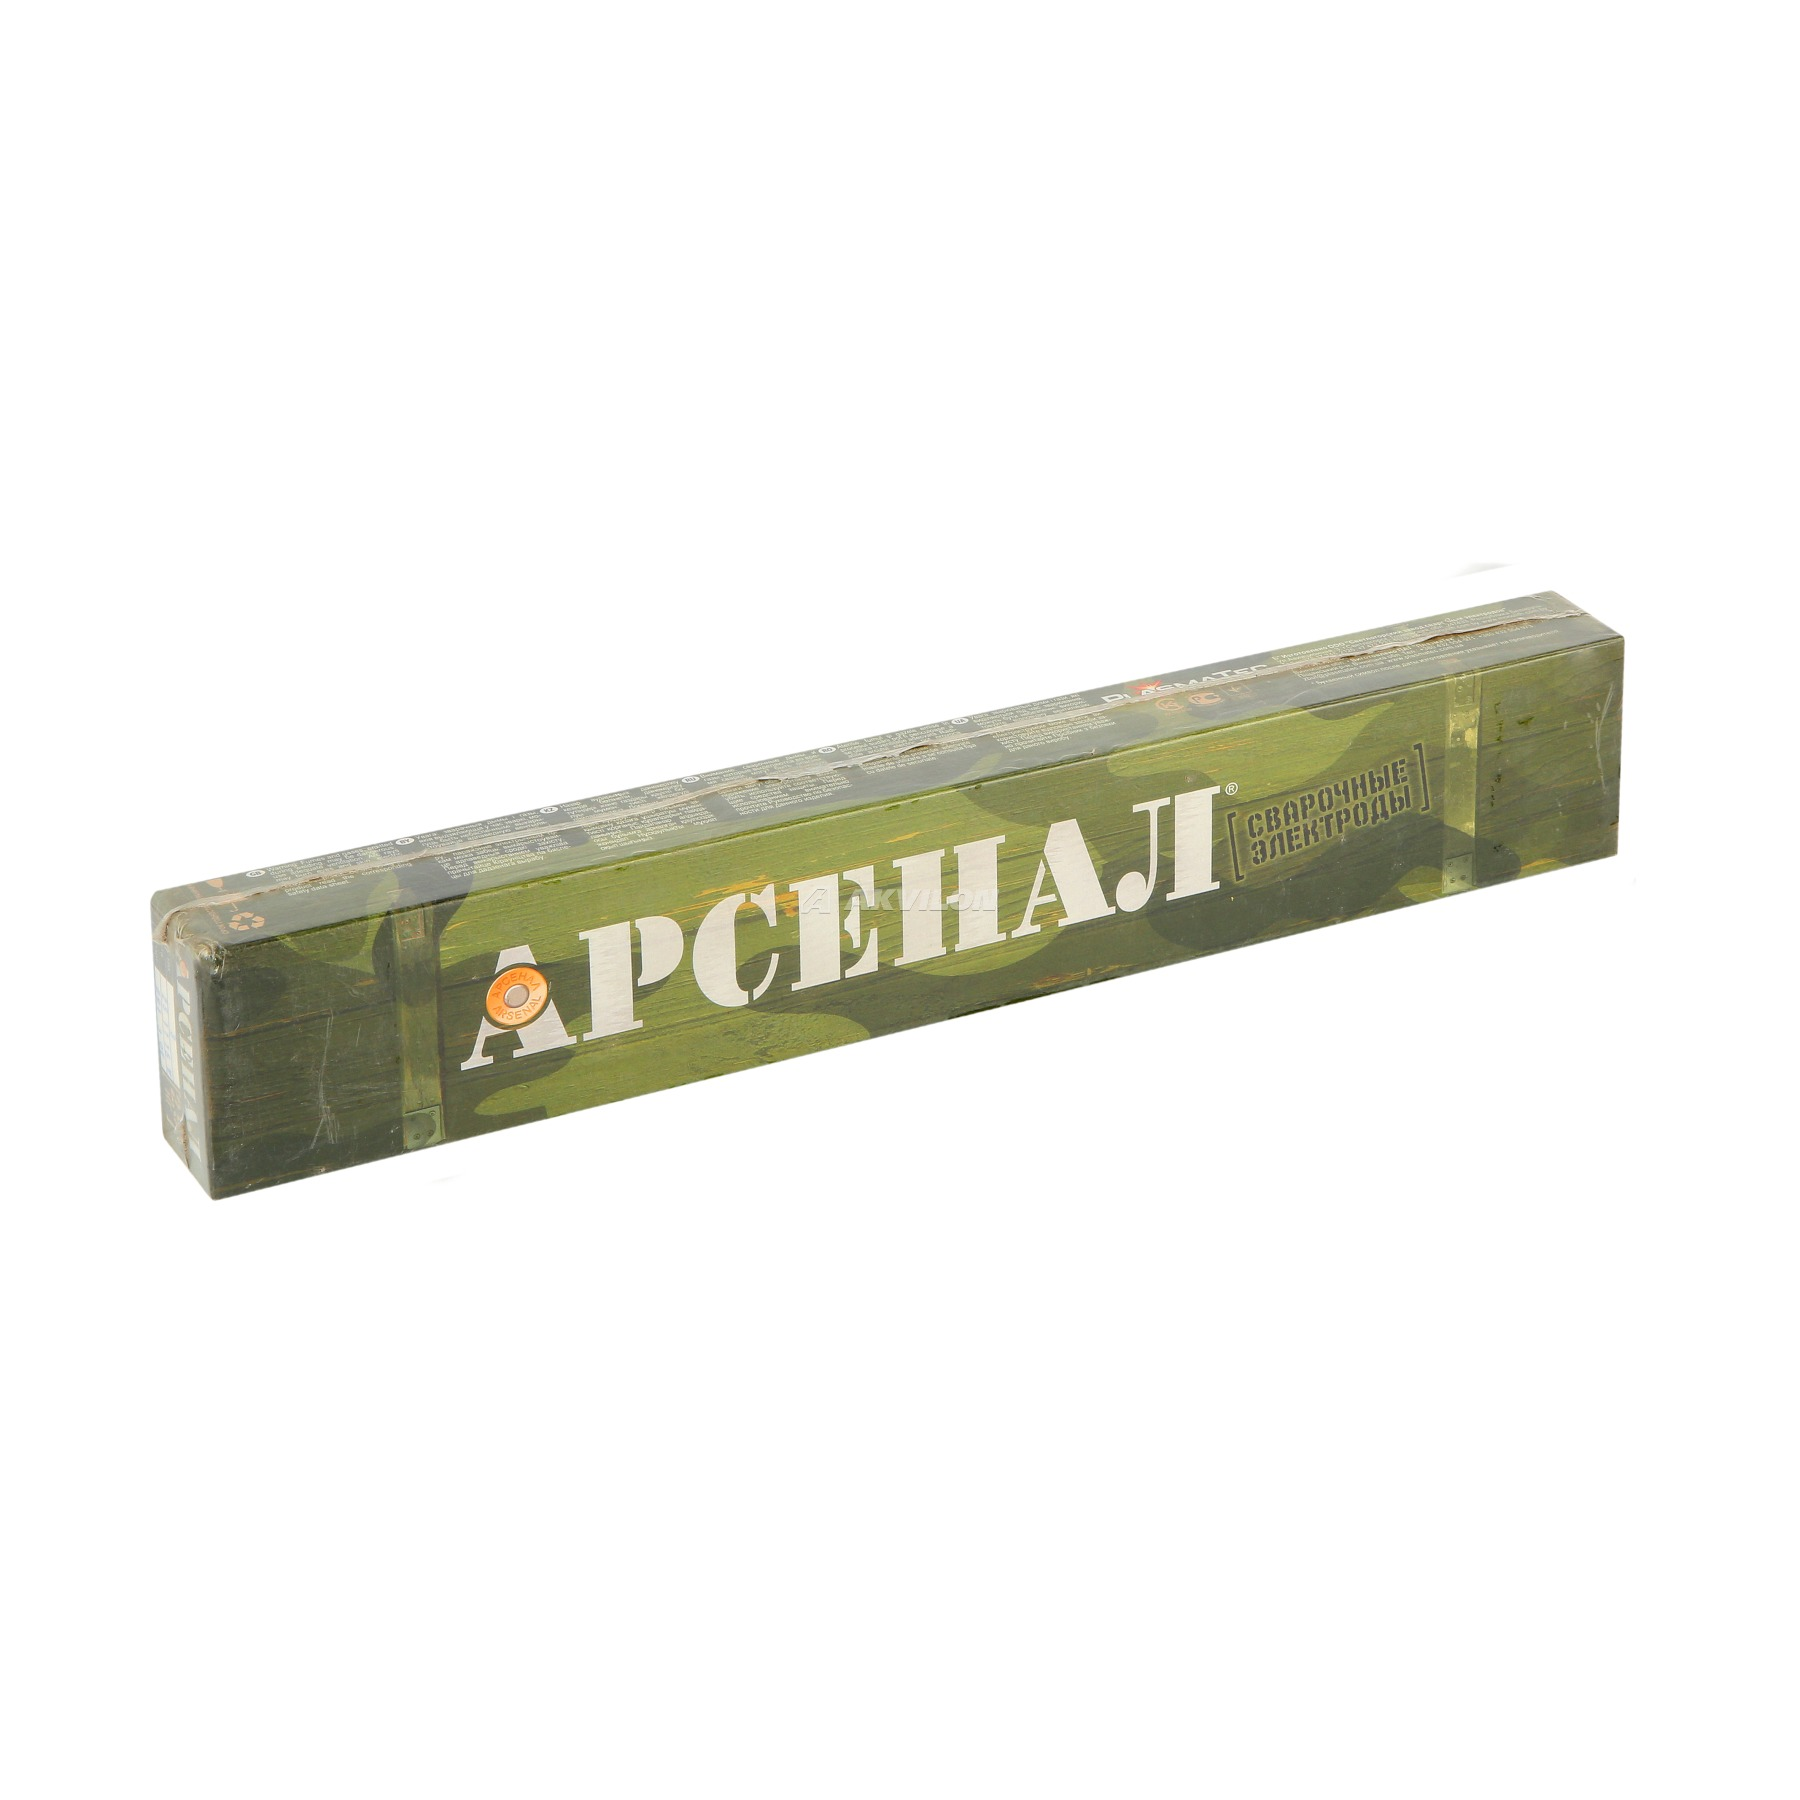 Расходные материалы Электроды PlasmaTec 3 мм Арсенал 2.5 кг МР-3 прокат, аренда Москва